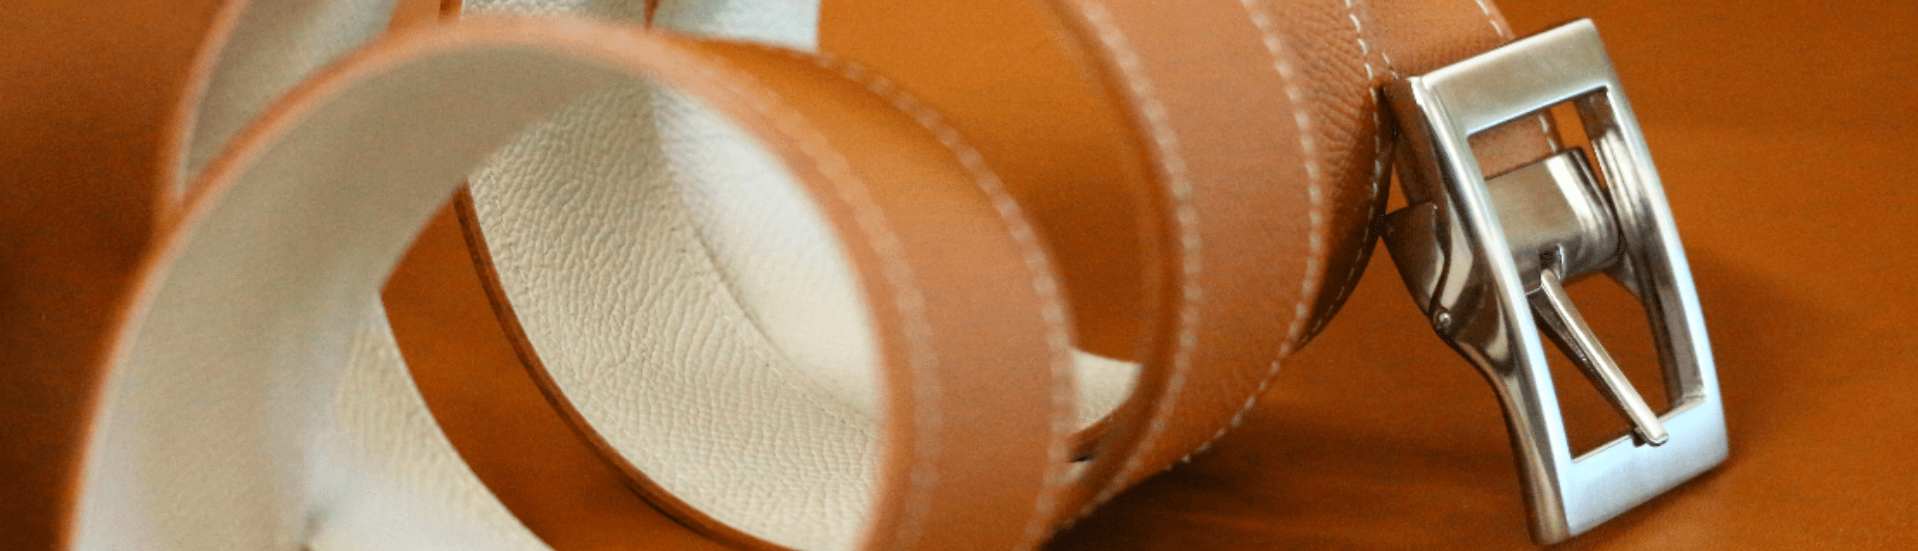 Ceinture cuir réversible camel vanille accessoire ofilducuir